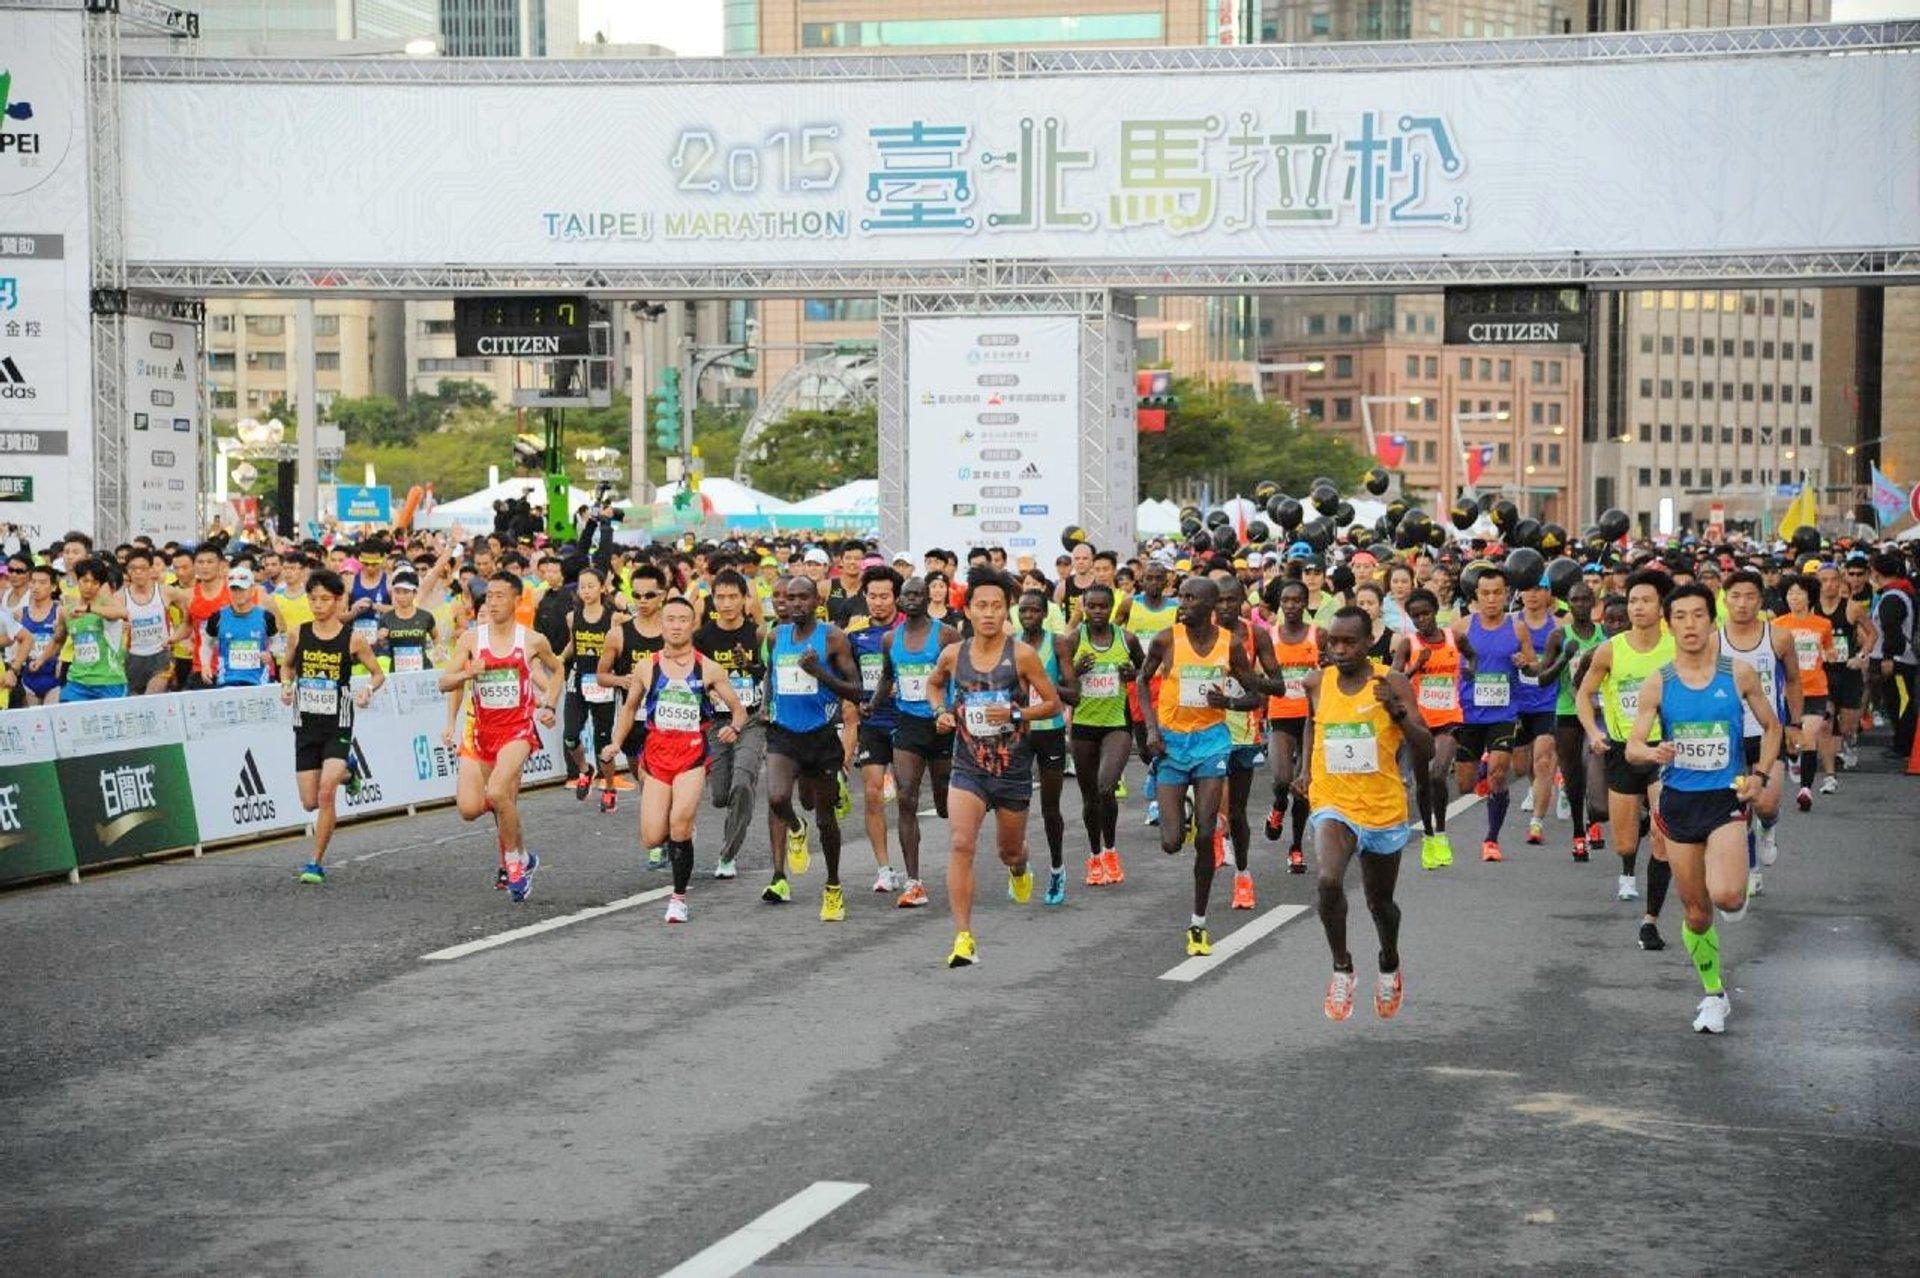 Taipei Marathon in Taiwan 2020 - Best Time